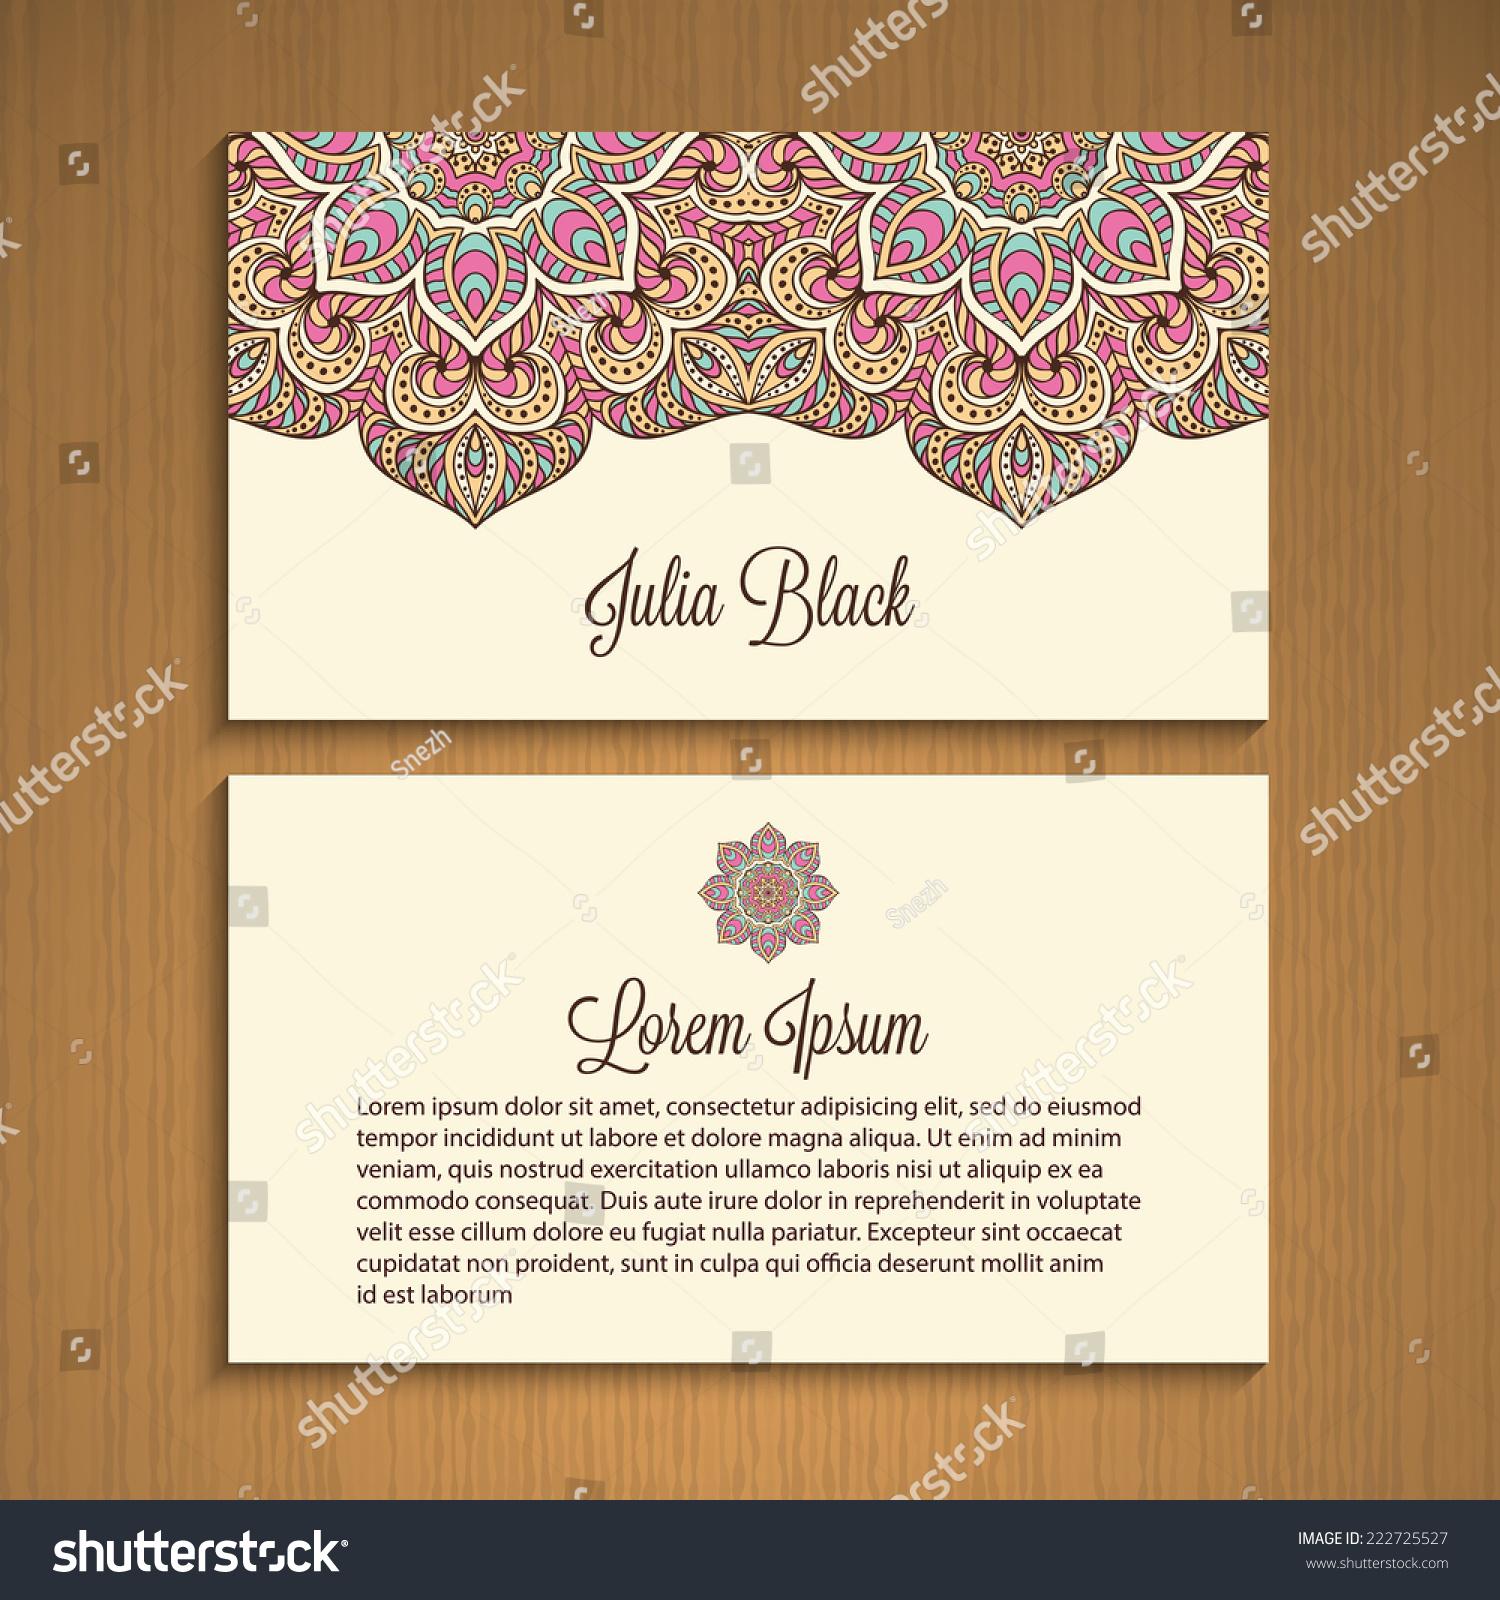 Business card invitation vector background vintage stock vector business card or invitation vector background vintage decorative elements hand drawn background junglespirit Gallery